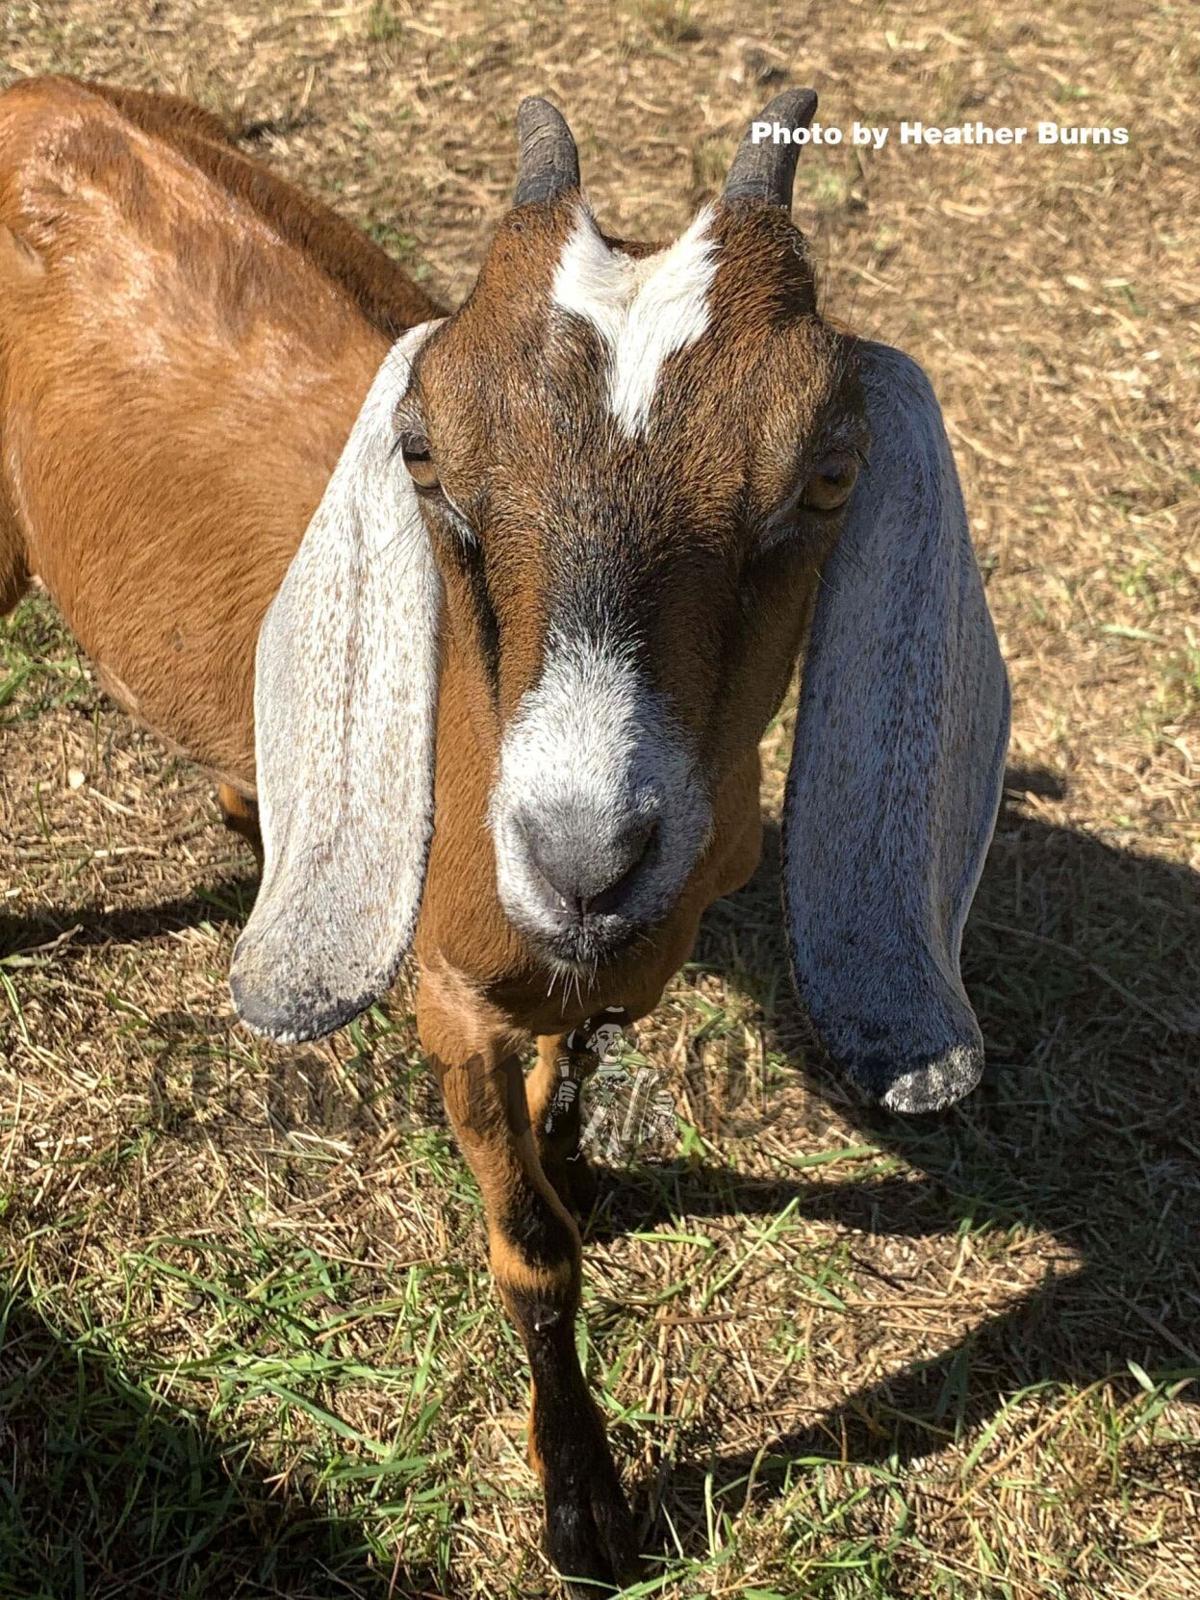 Pet the goats at the Pumpkin Festival